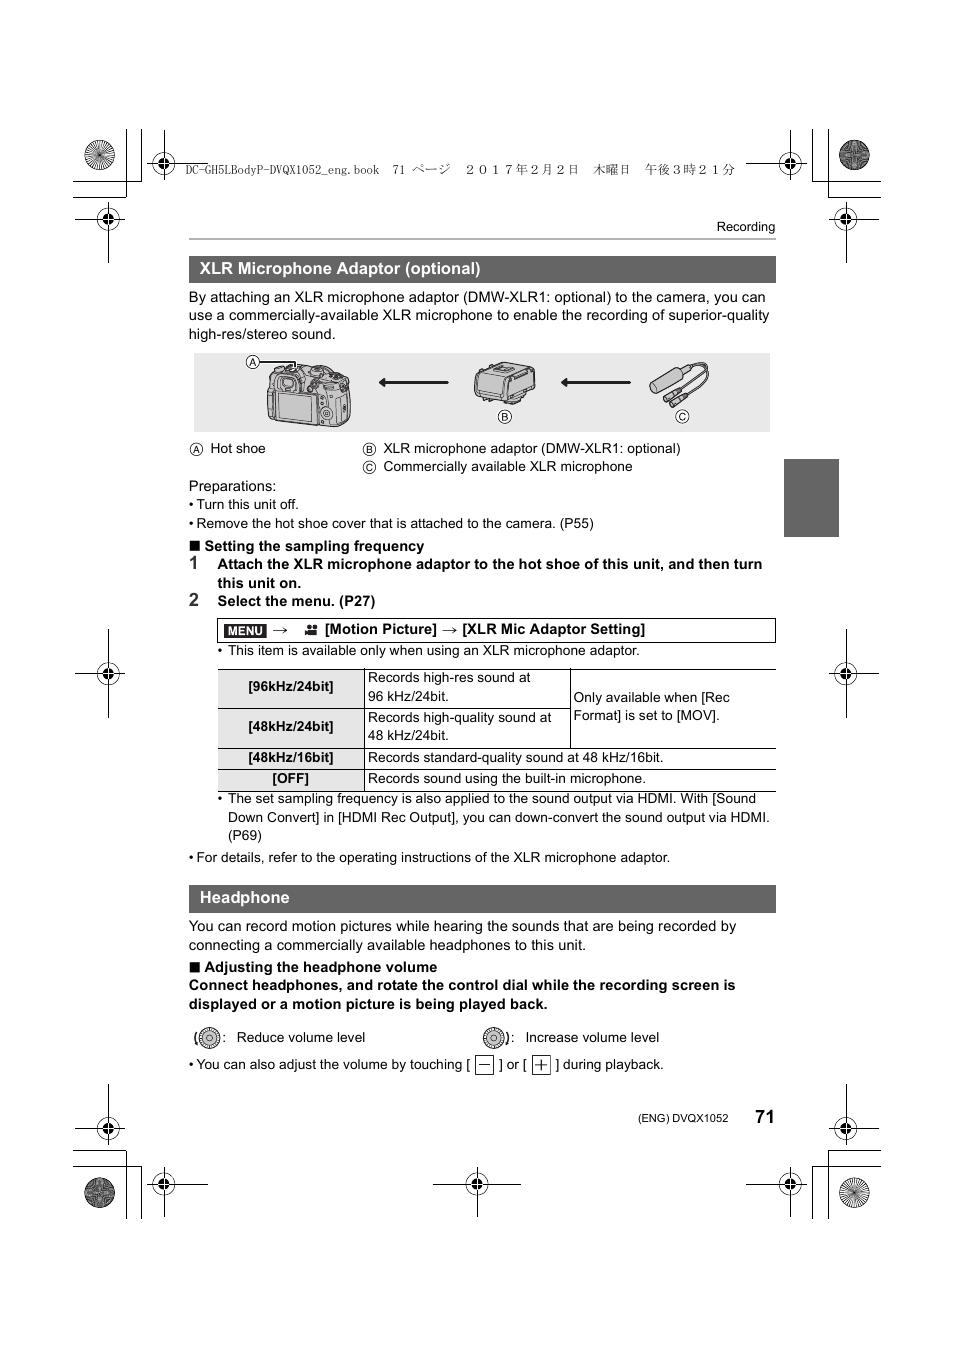 Panasonic Lumix GH5 User Manual | Page 71 / 128